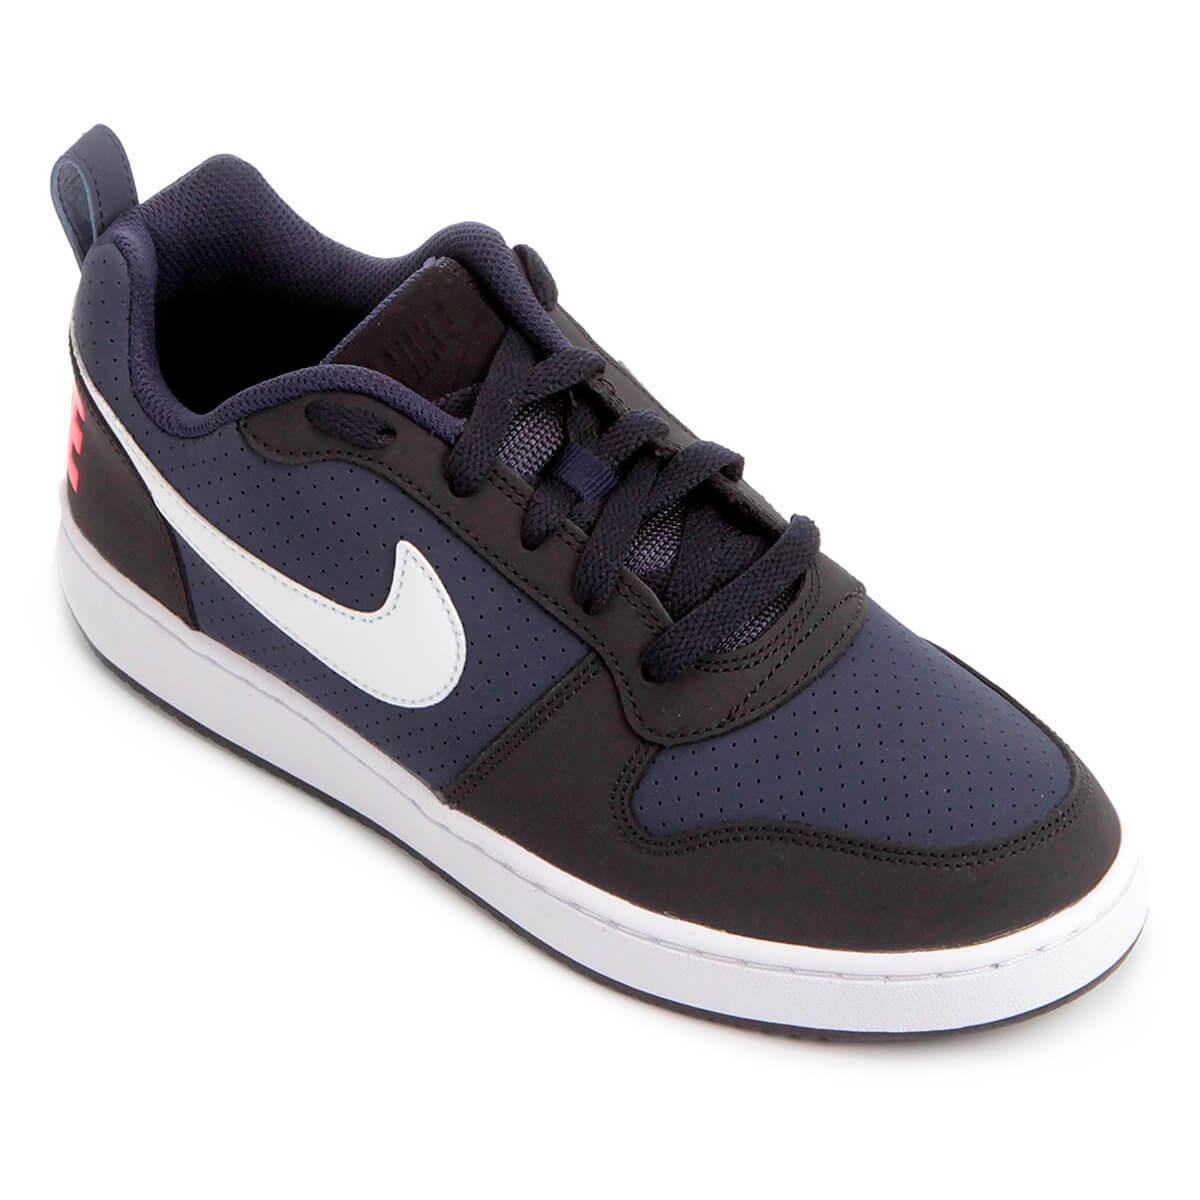 1f1209d2dfd Tênis Nike Court Borough Low Casual Masculino - Decker Online!